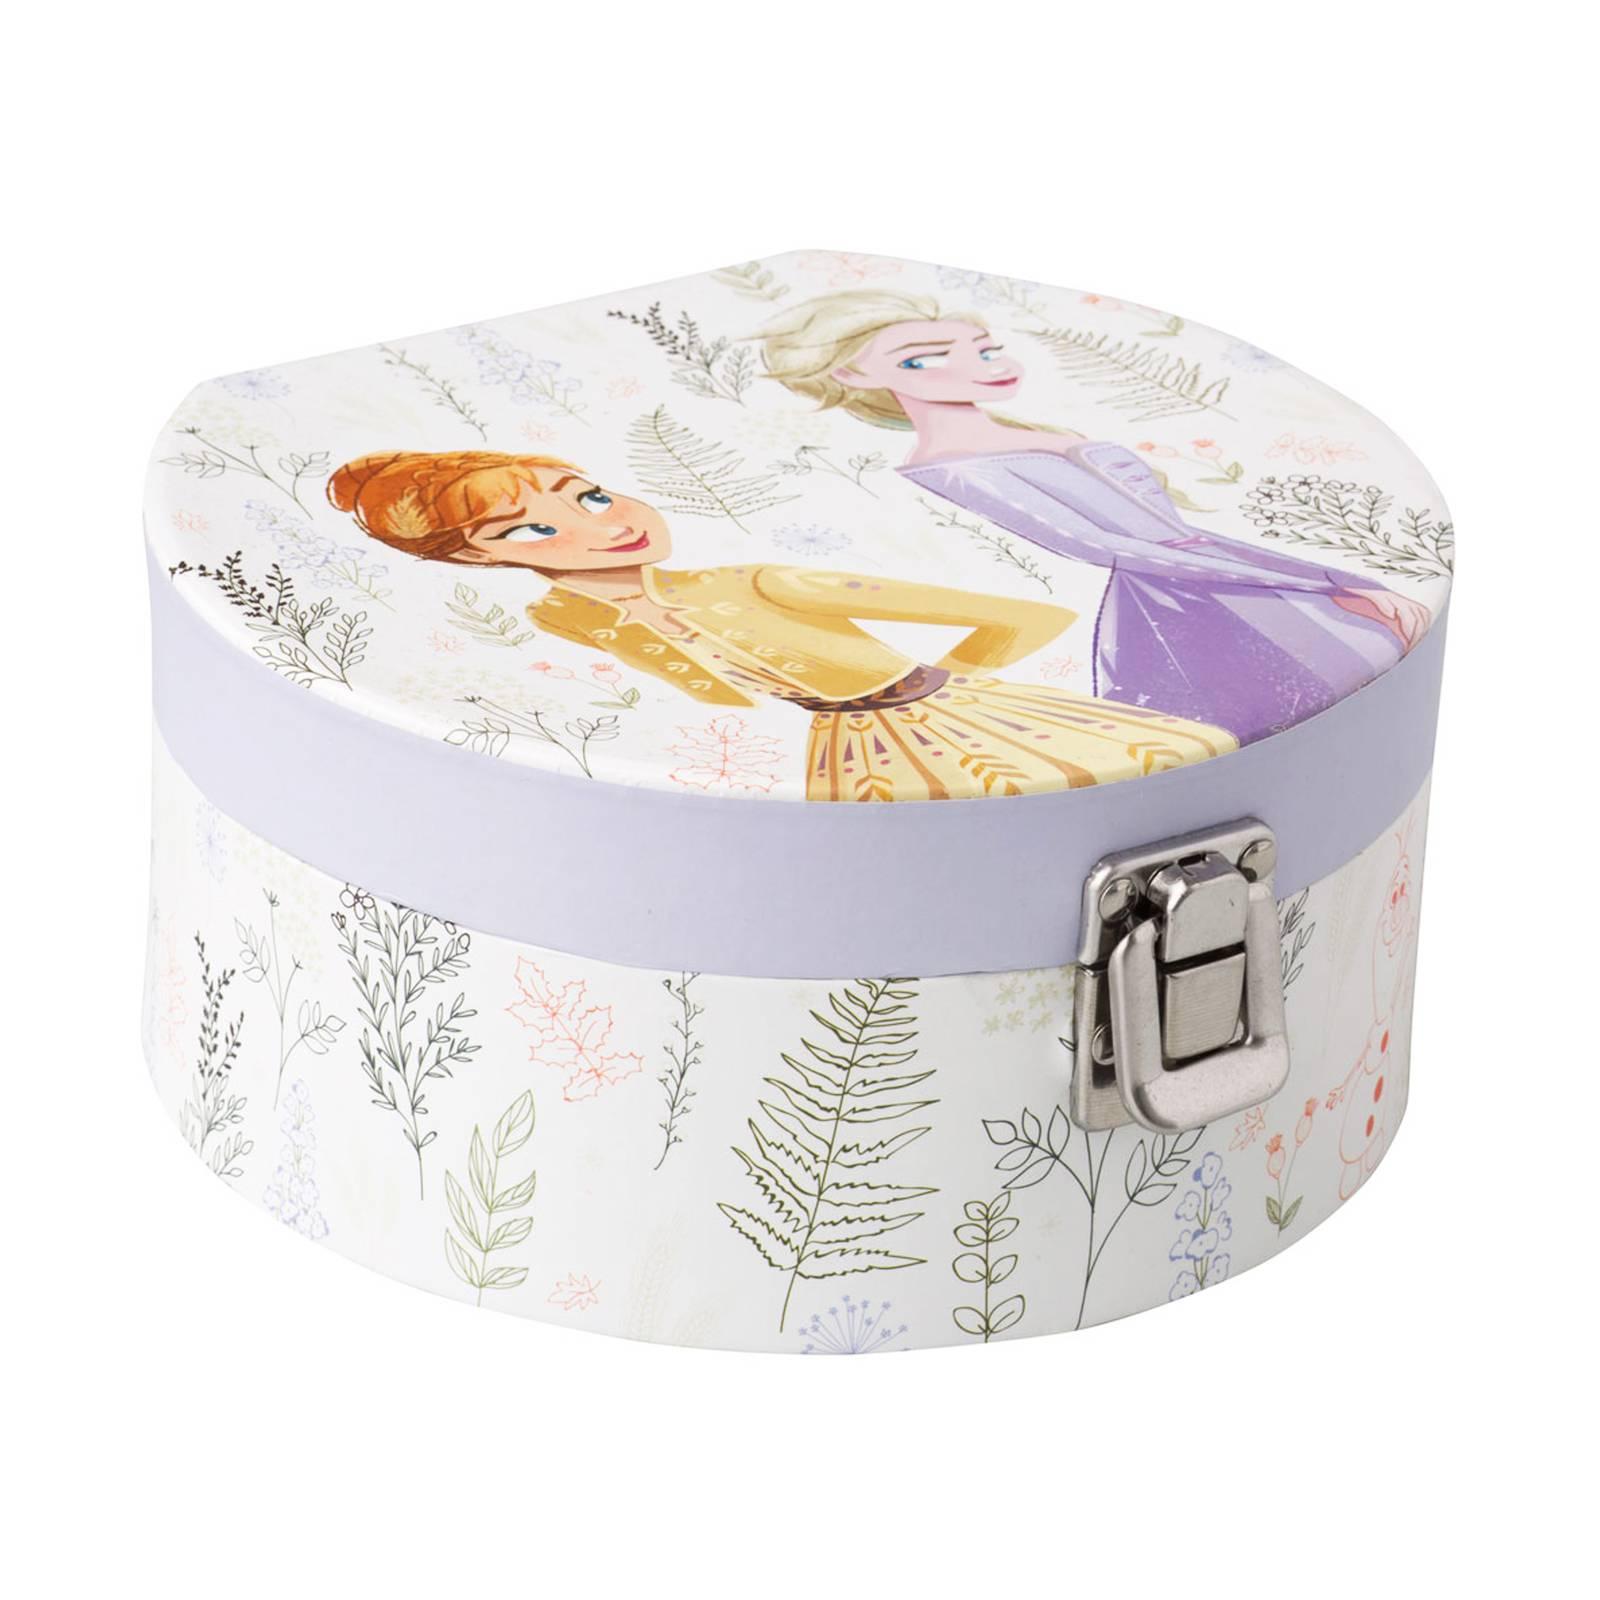 Jewellery box with mirror Frozen II Herbal 17 x 15,5 x 8 cm DISNEY